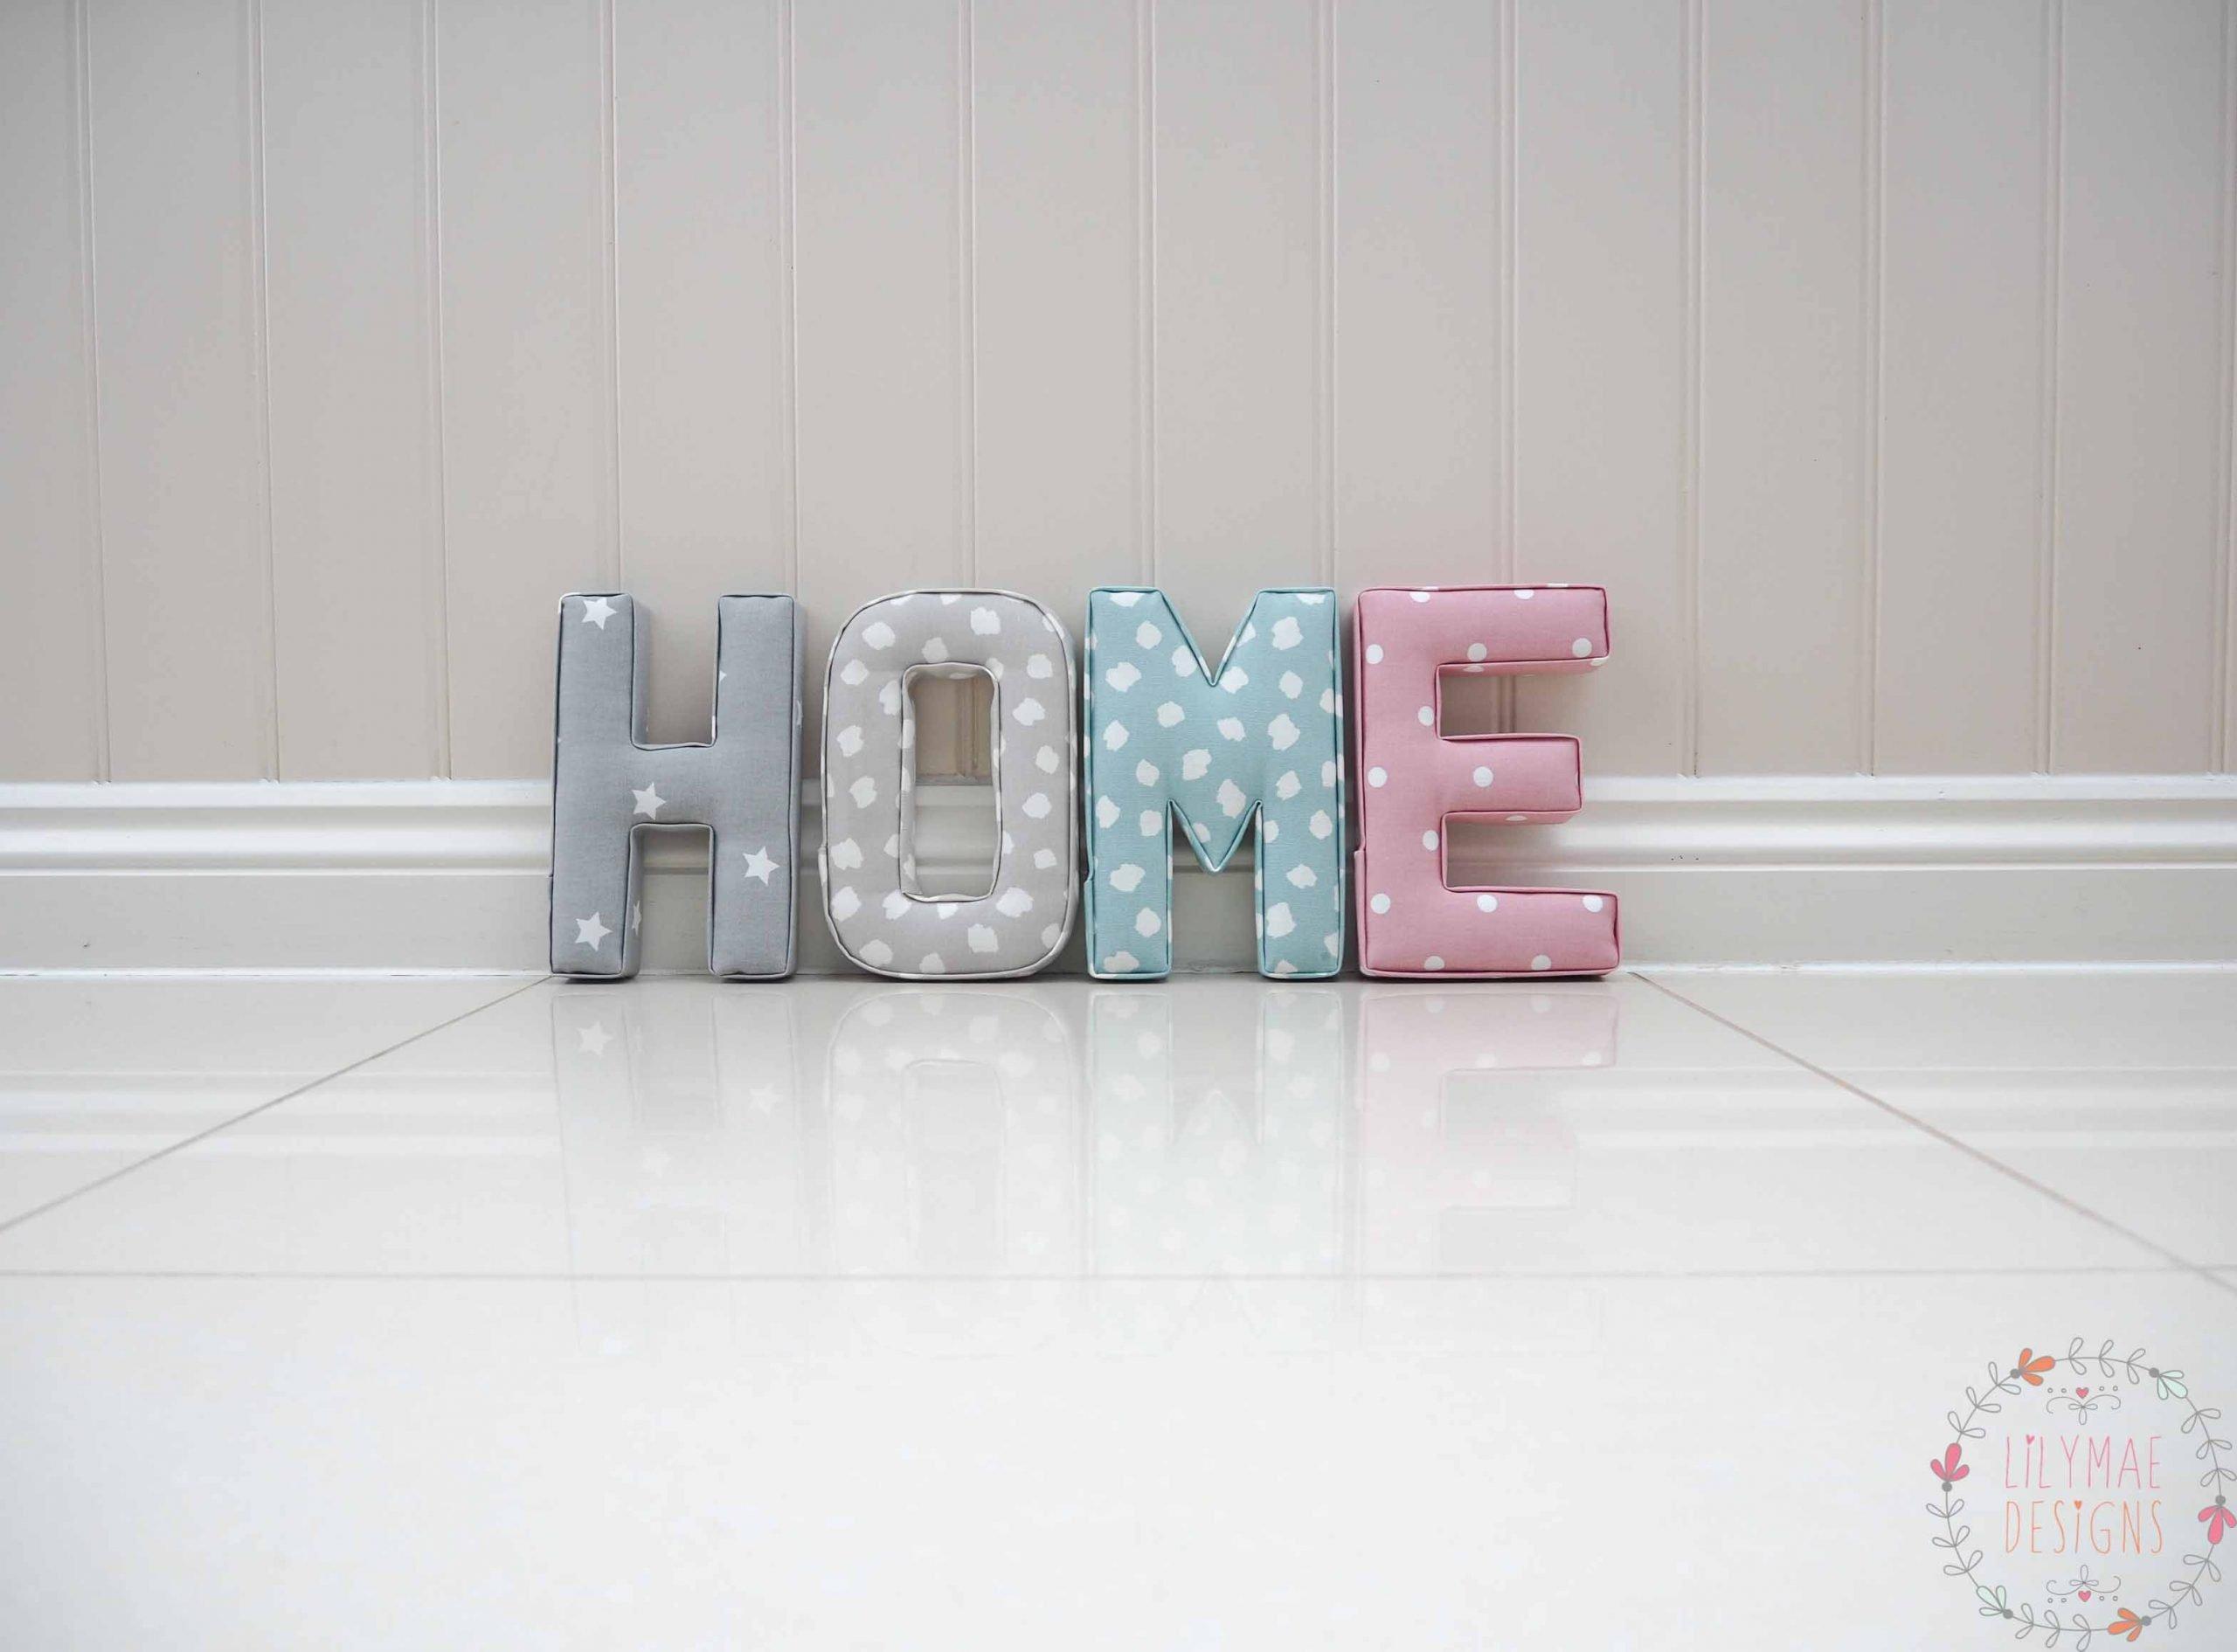 Home nameset 2 H Twinkle Rubble, O Clio Smoke, M Clio Mineral, E Dotty Rose Nameset Gallery